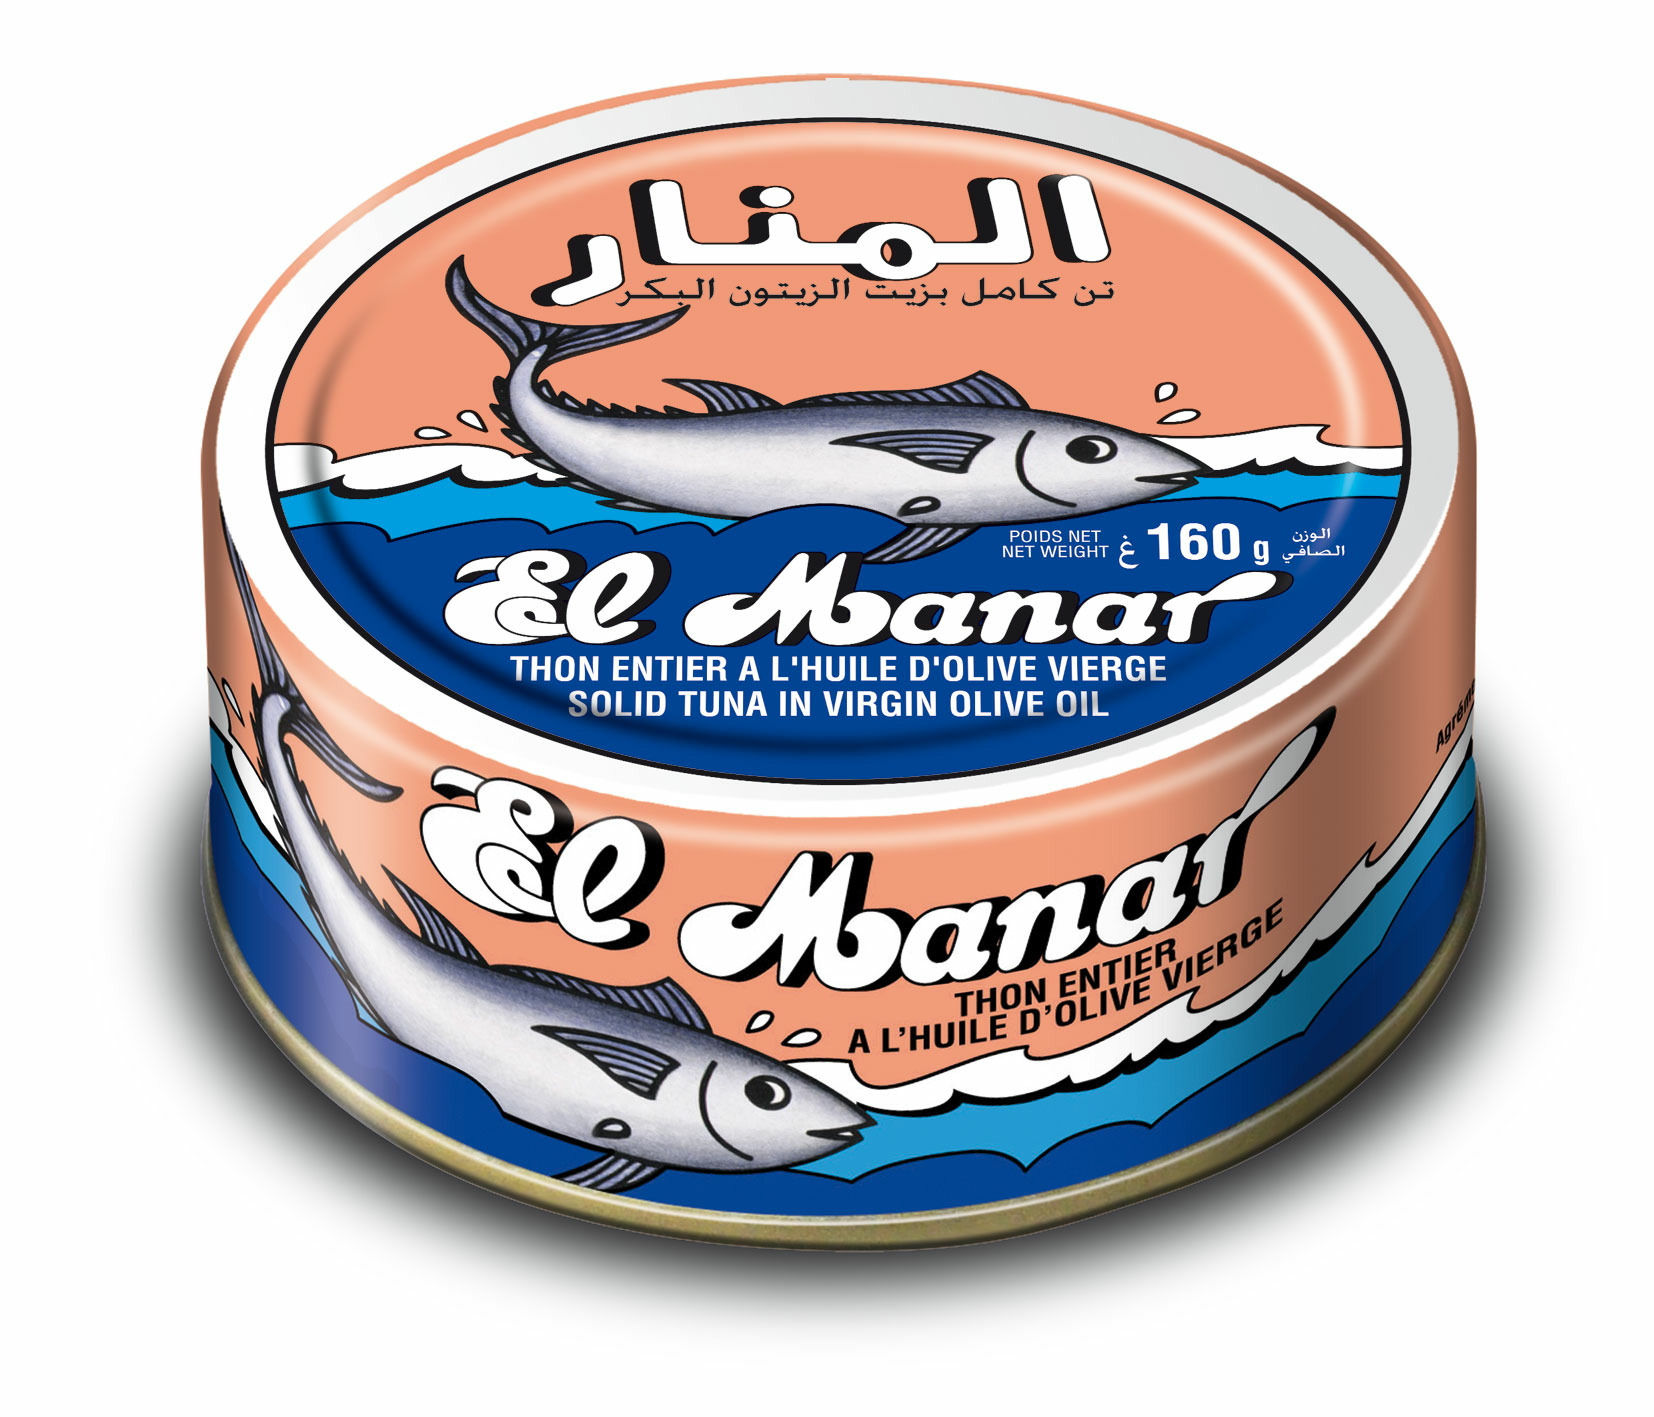 Manar-160HO-3D_jpg.png